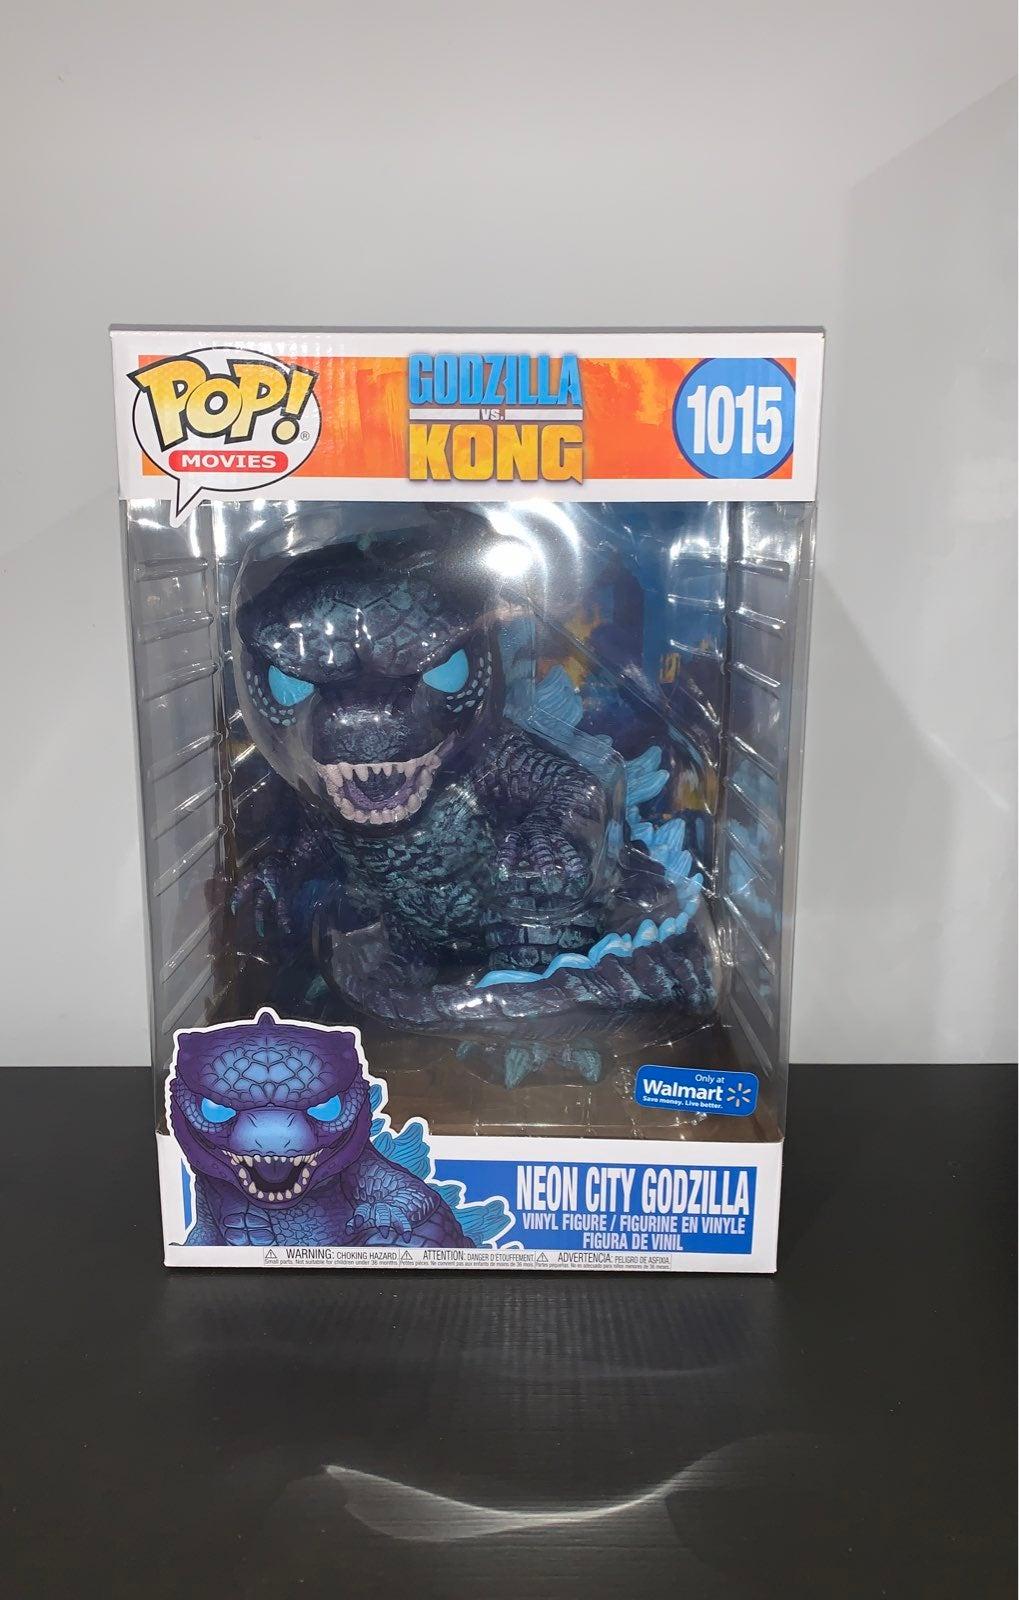 Funko Pop! movies 1015 Godzilla 10 inch